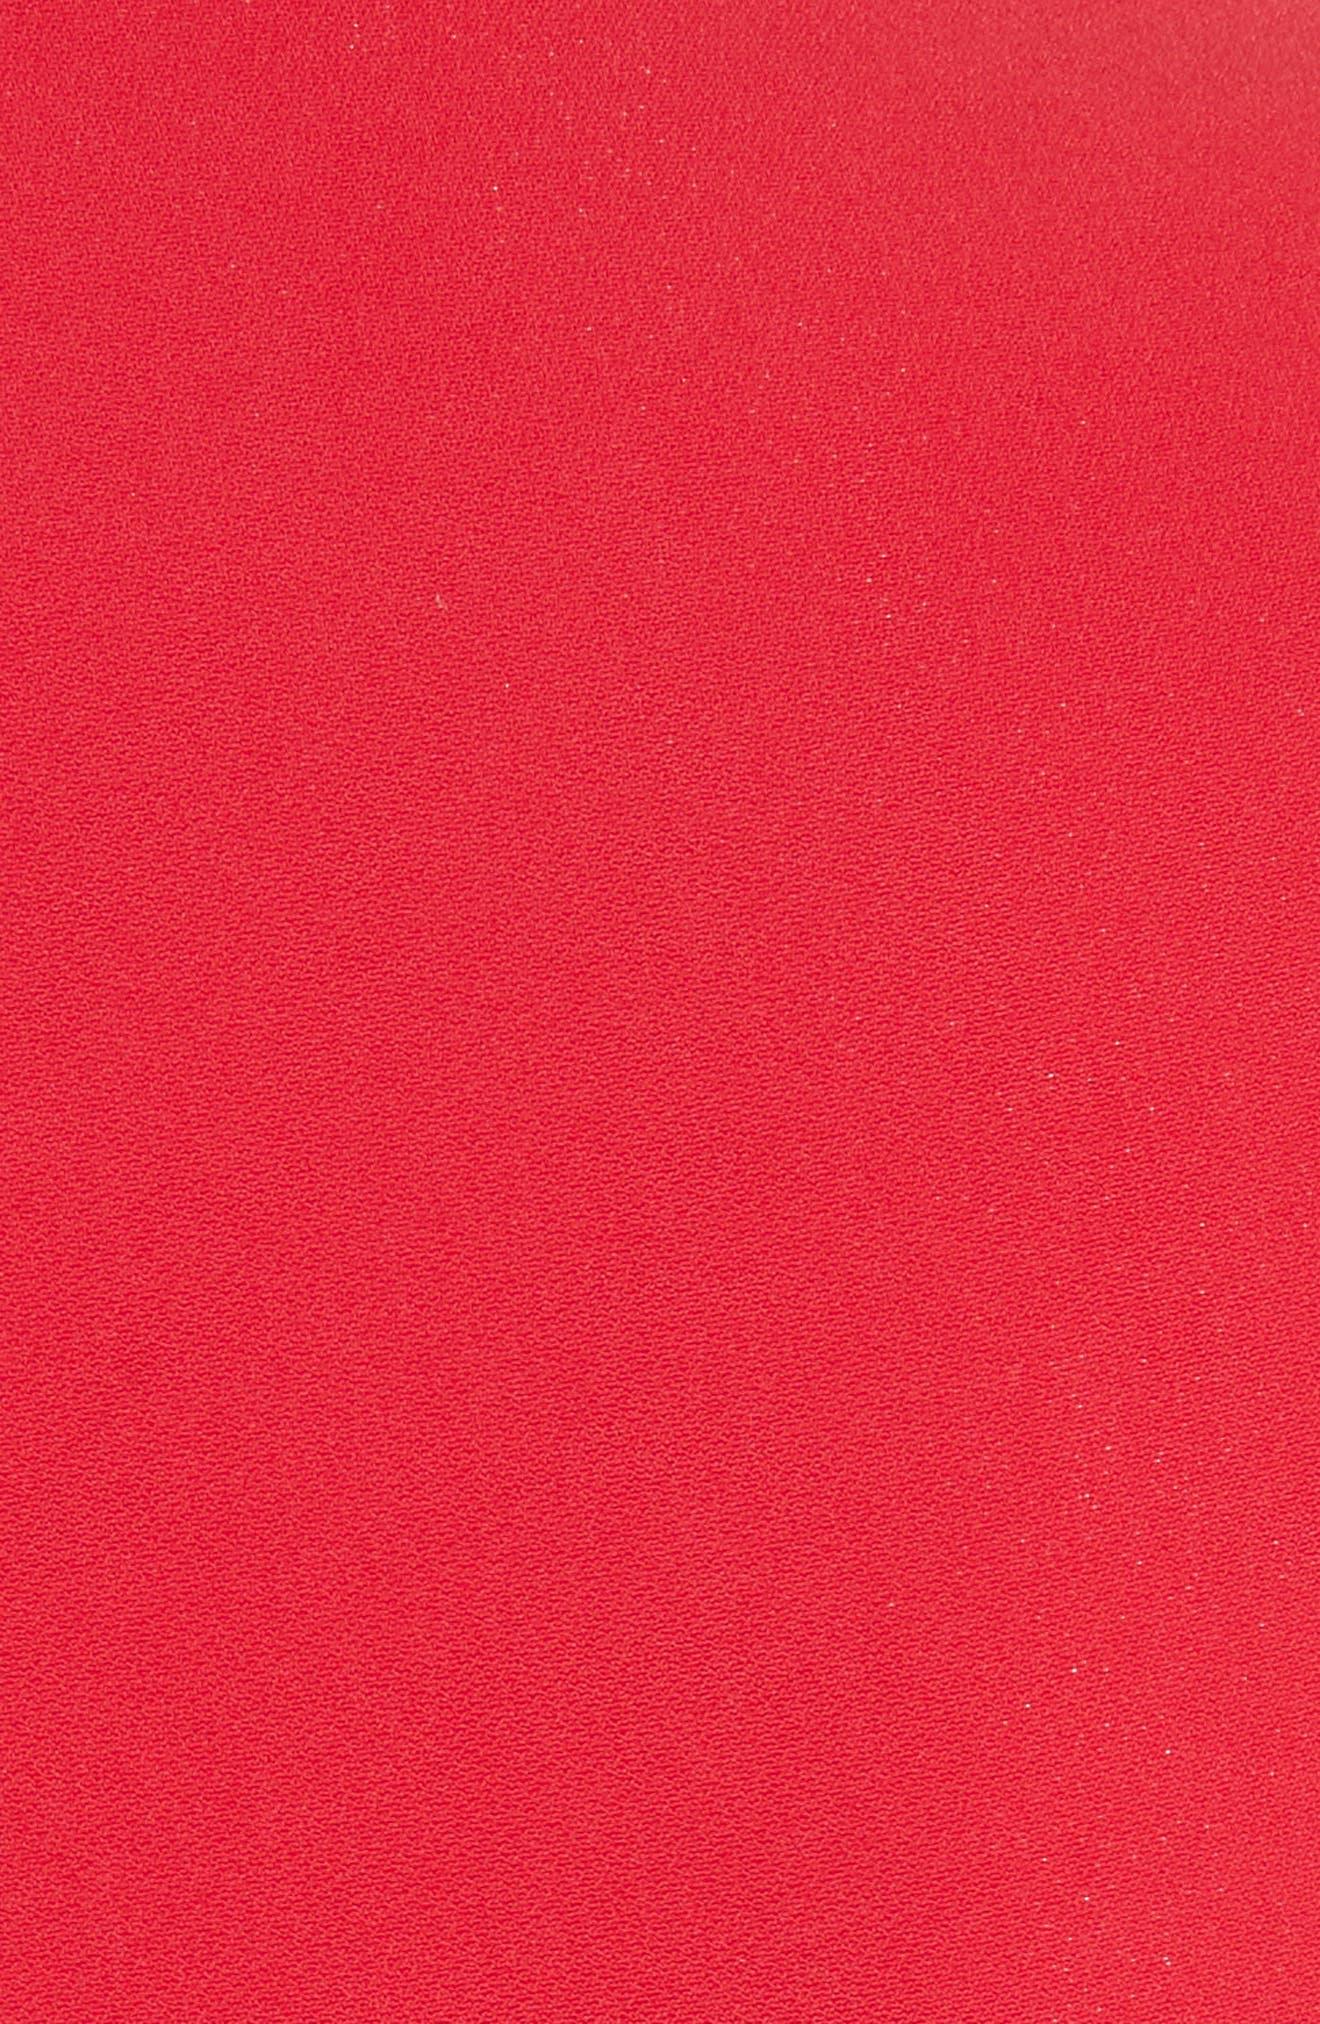 Drape Pocket Crepe Jacket,                             Alternate thumbnail 6, color,                             600